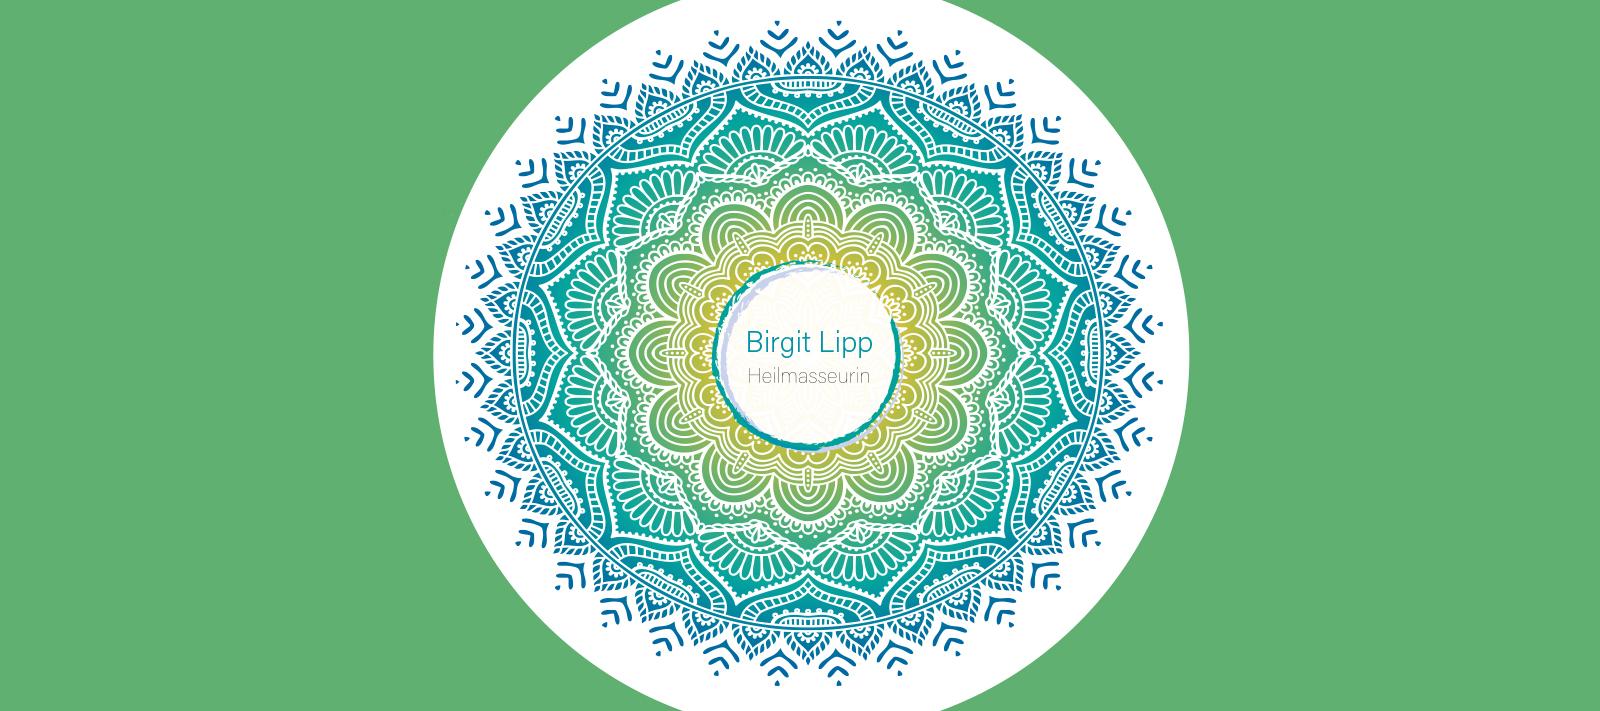 Logo Birgit Lipp Heilmasseurin / Mandala